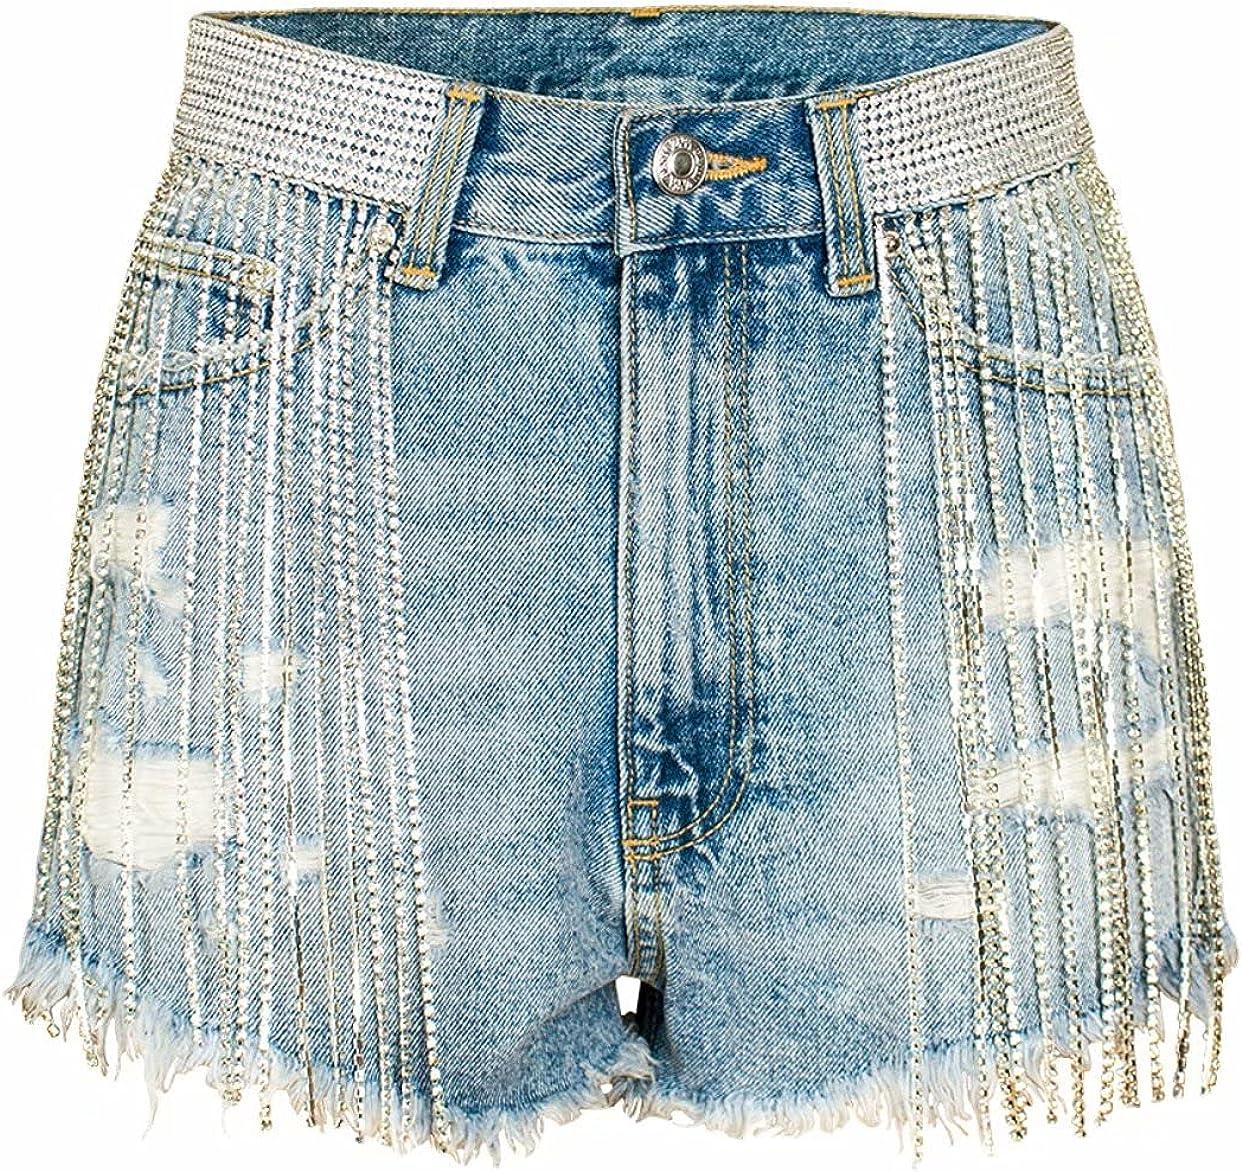 Alilyol Women's High Waist Distressed Tassel Denim Shorts Bling Rhinestone Denim Shorts Crystal Belt Short Jean Summer